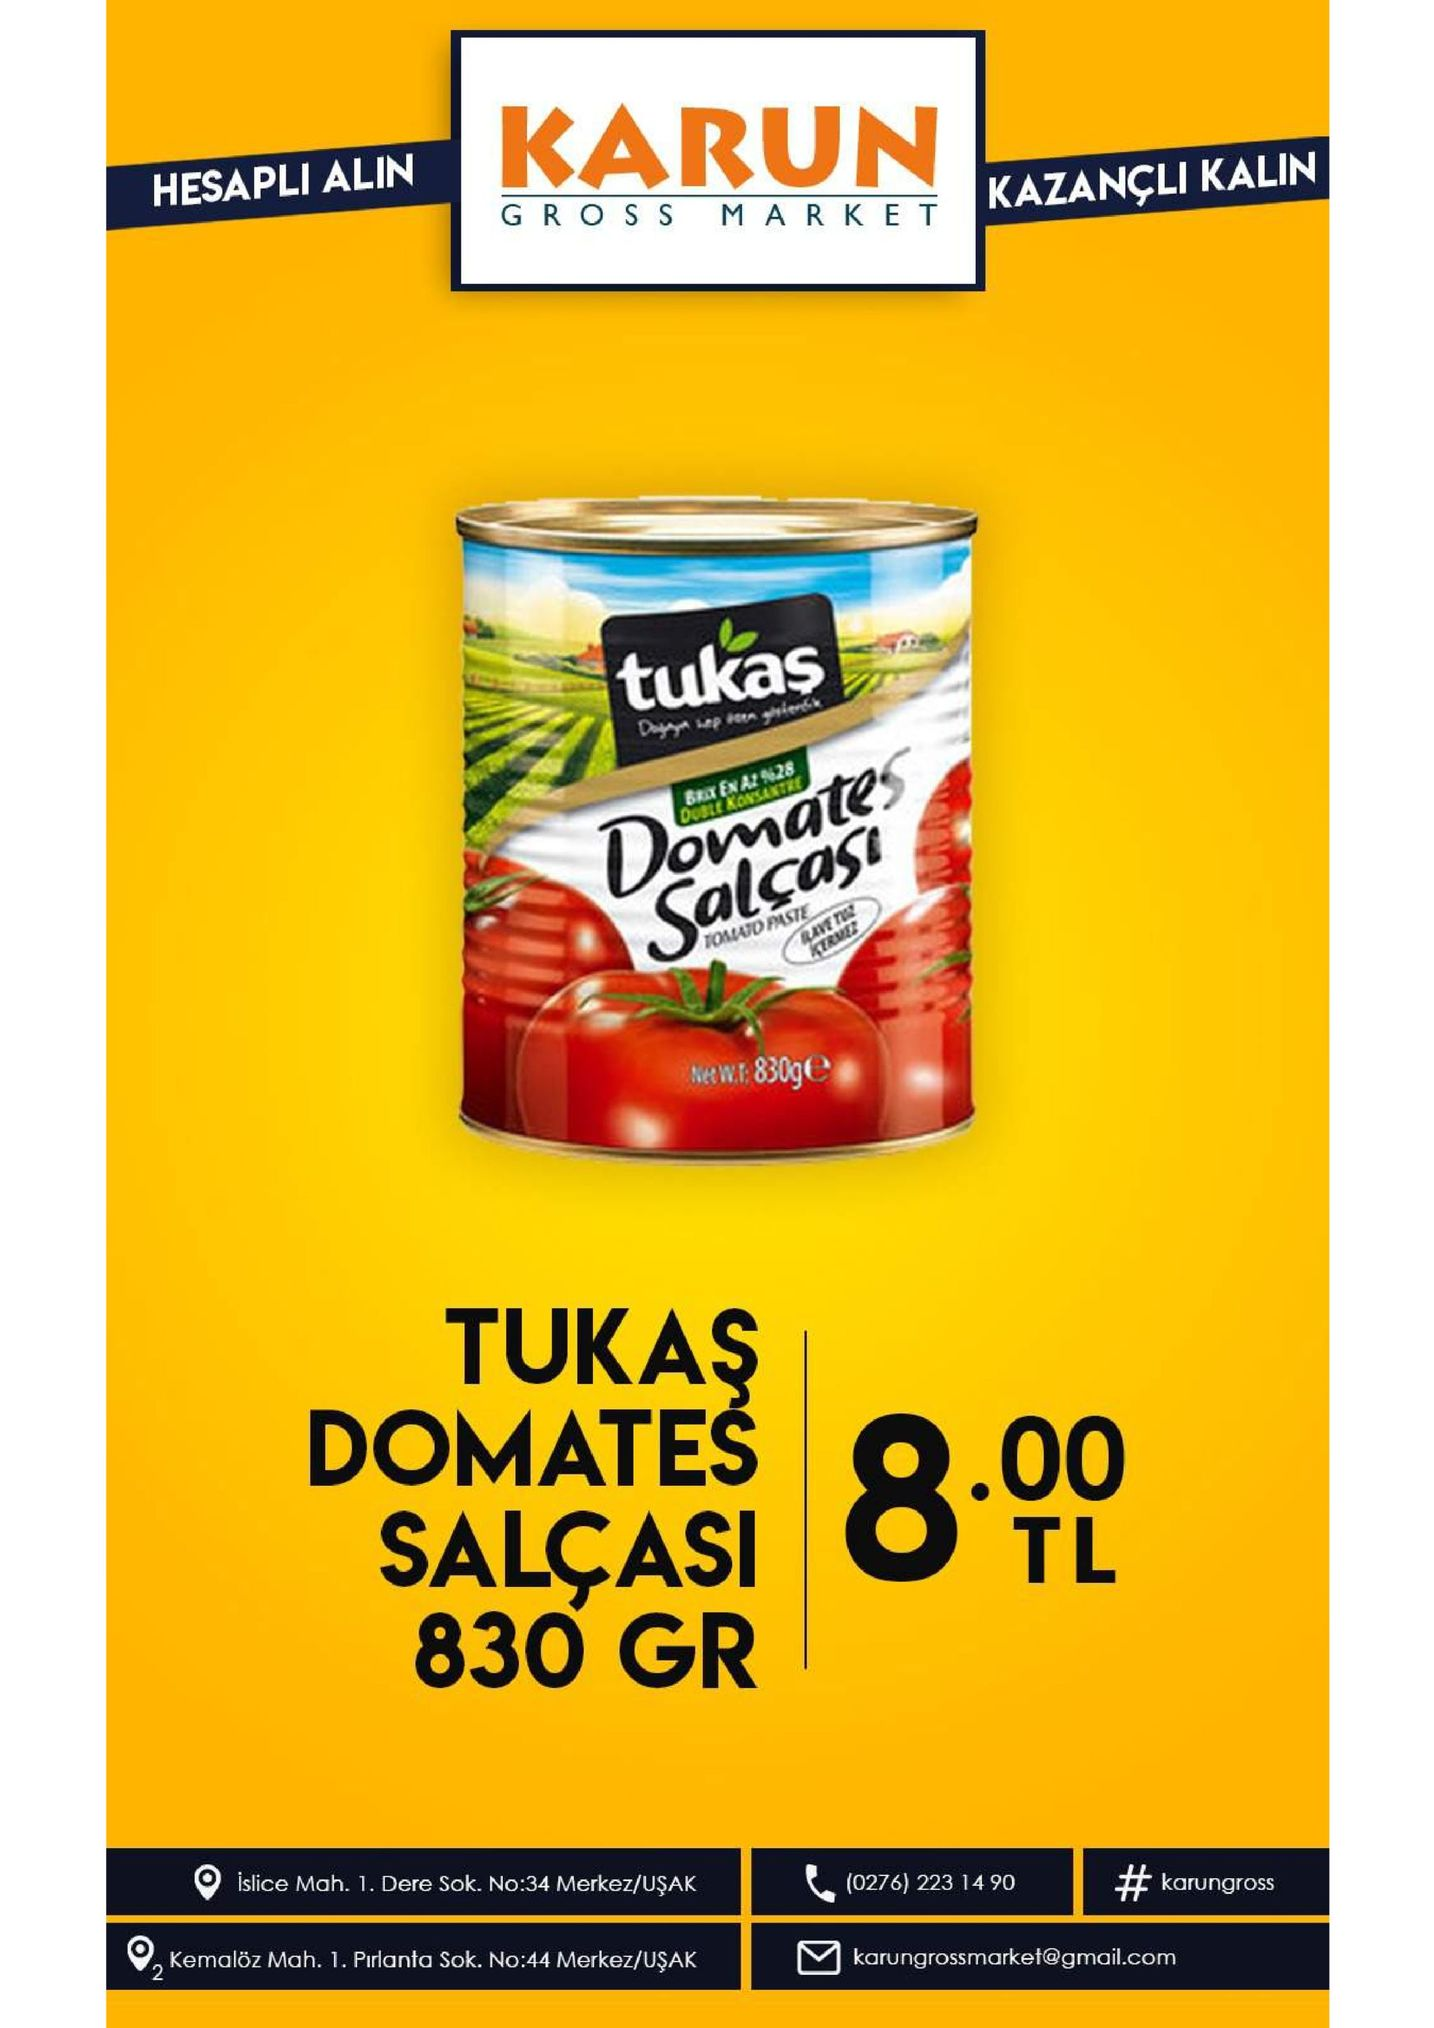 karun hesapli alin gro s s mark e t kazancli kalin tukas dayzn penenk domates salcasi brx en a1 9628 oosle konsantre tomato paste barwee ewr 830ge tukaş domates salcasi.00 830 gr tl islice mah. 1. dere sok. no:34 merkez/uşak (0276) 223 14 90 # karungross kemalöz mah. 1. pirlanta sok. no:44 merkez/uşak 2 karungrossmarket@gmail.com